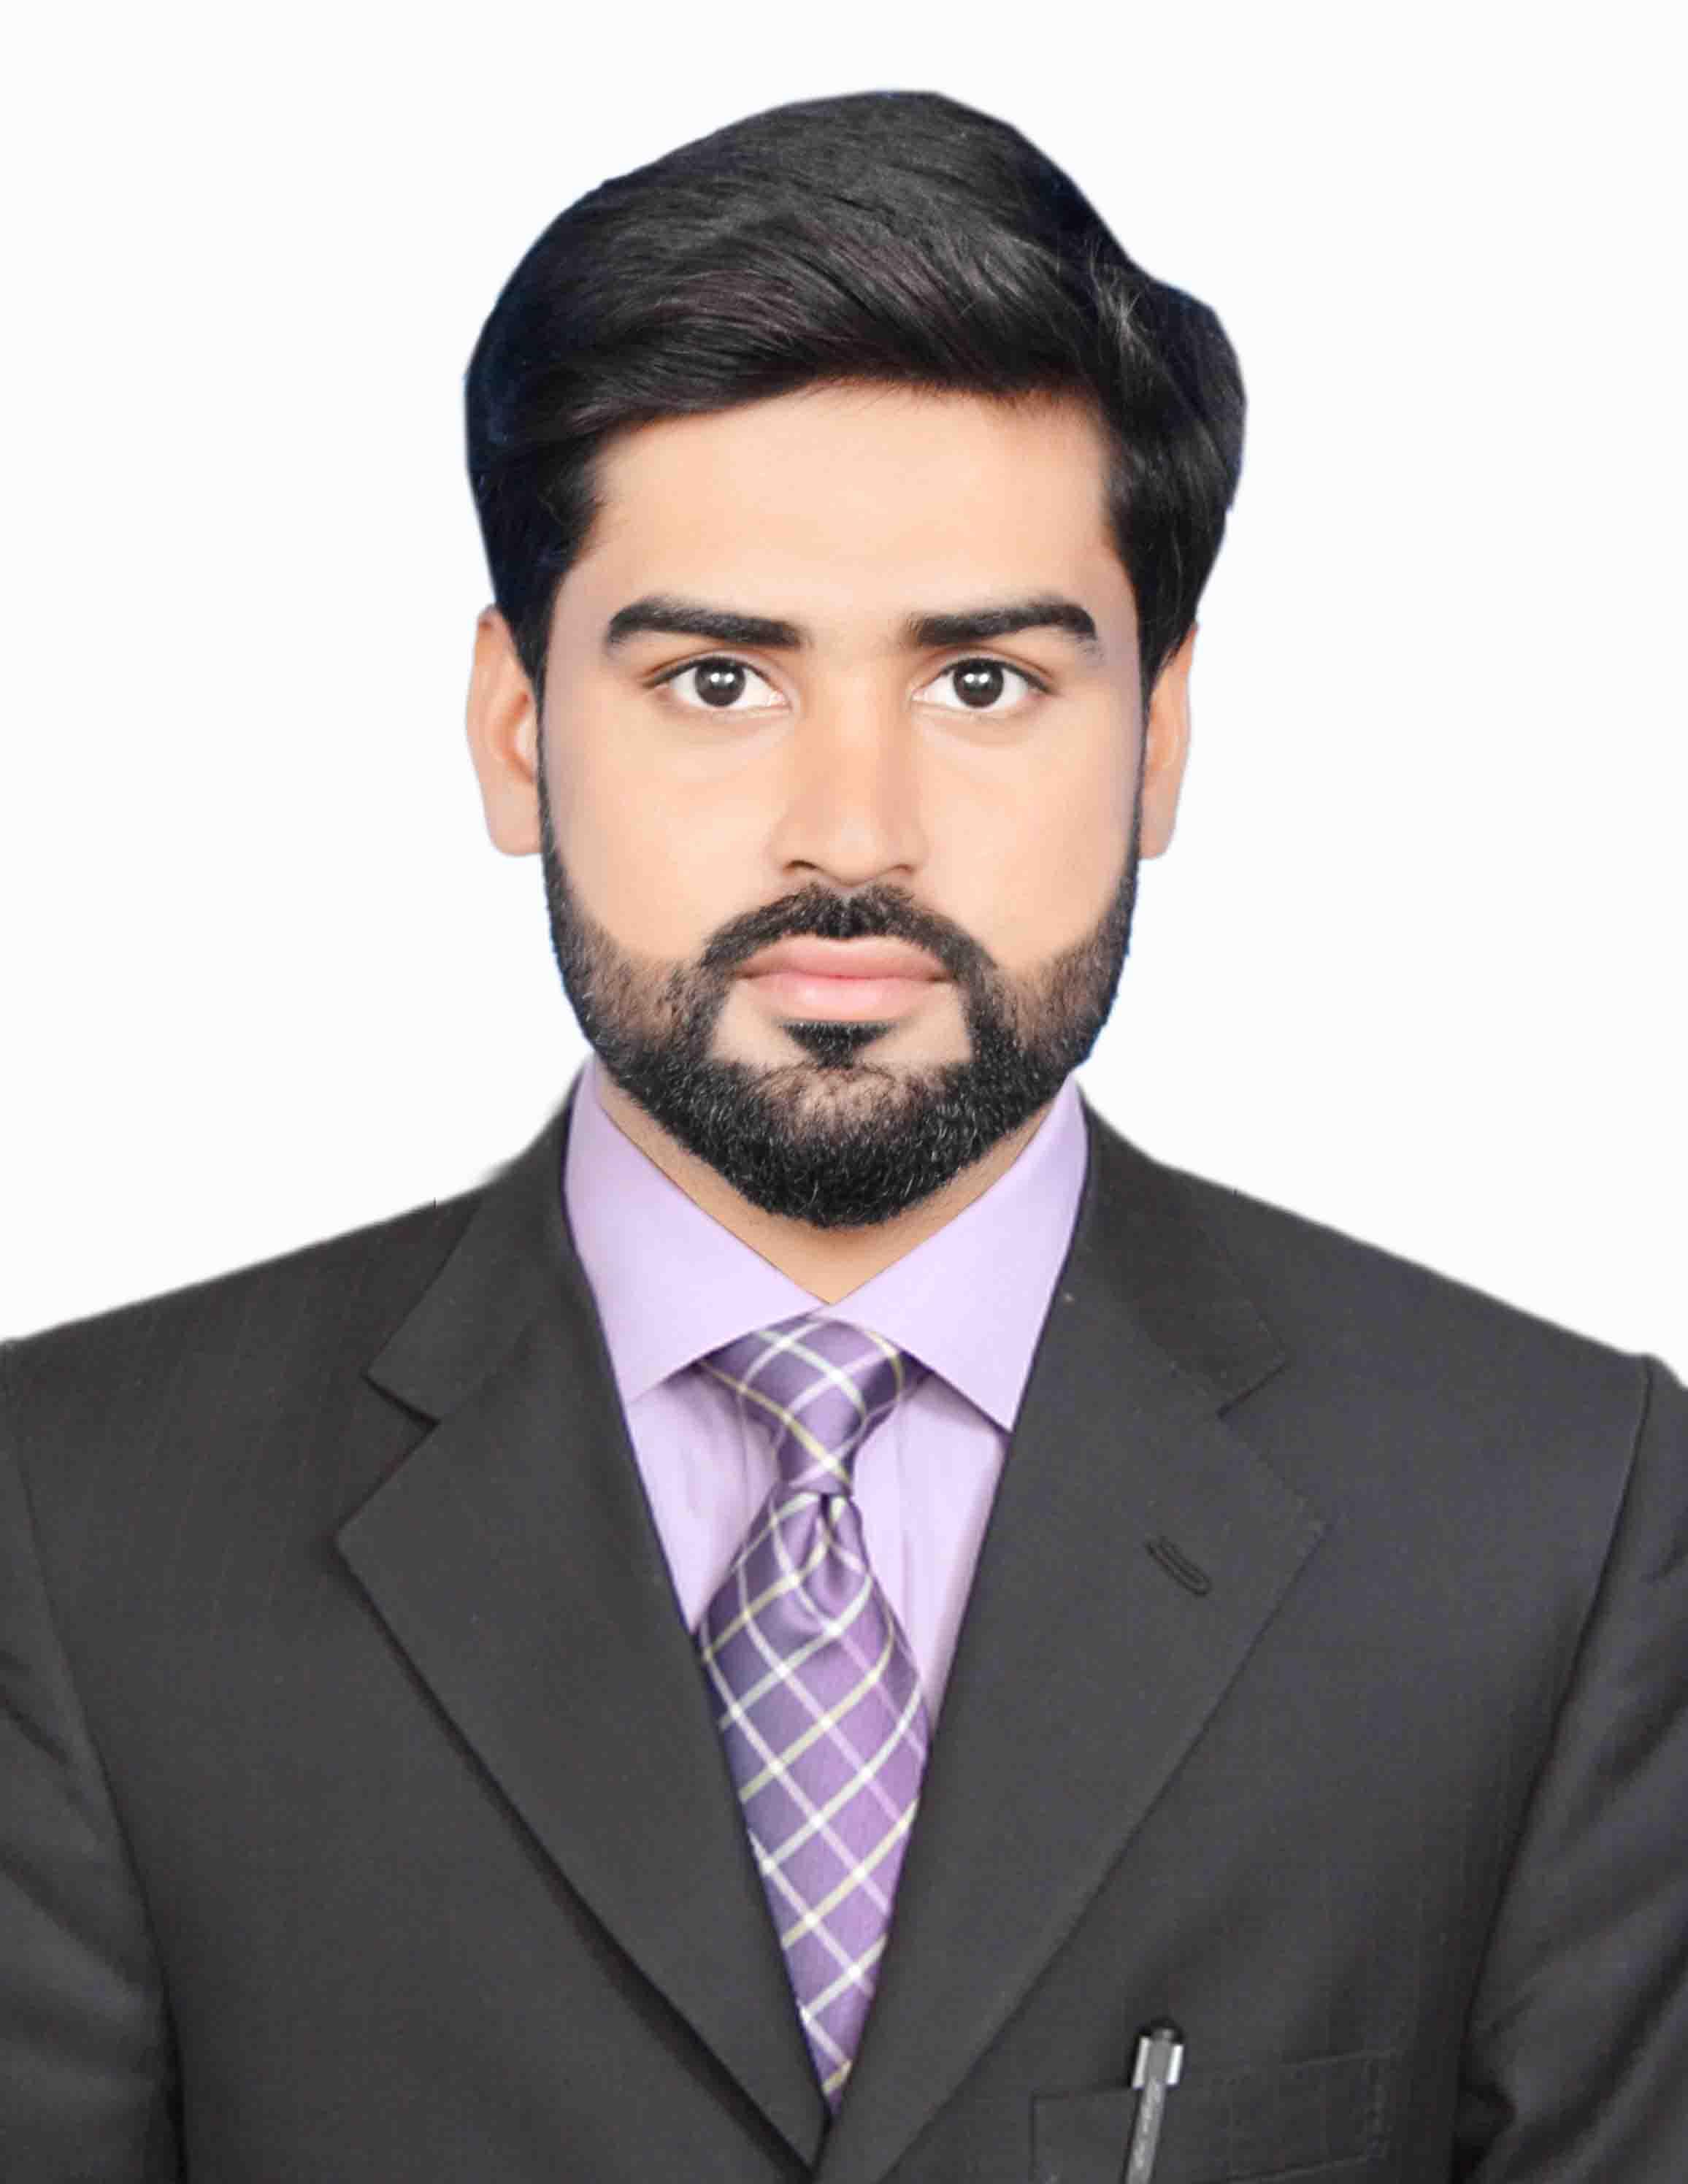 Muhammad Adnan Qamar Business Cards, Concept Design, Logo Design, Photography, Photoshop Design, Poster Design, Contracts, Customer Experience, Customer Retention, Customer Strategy